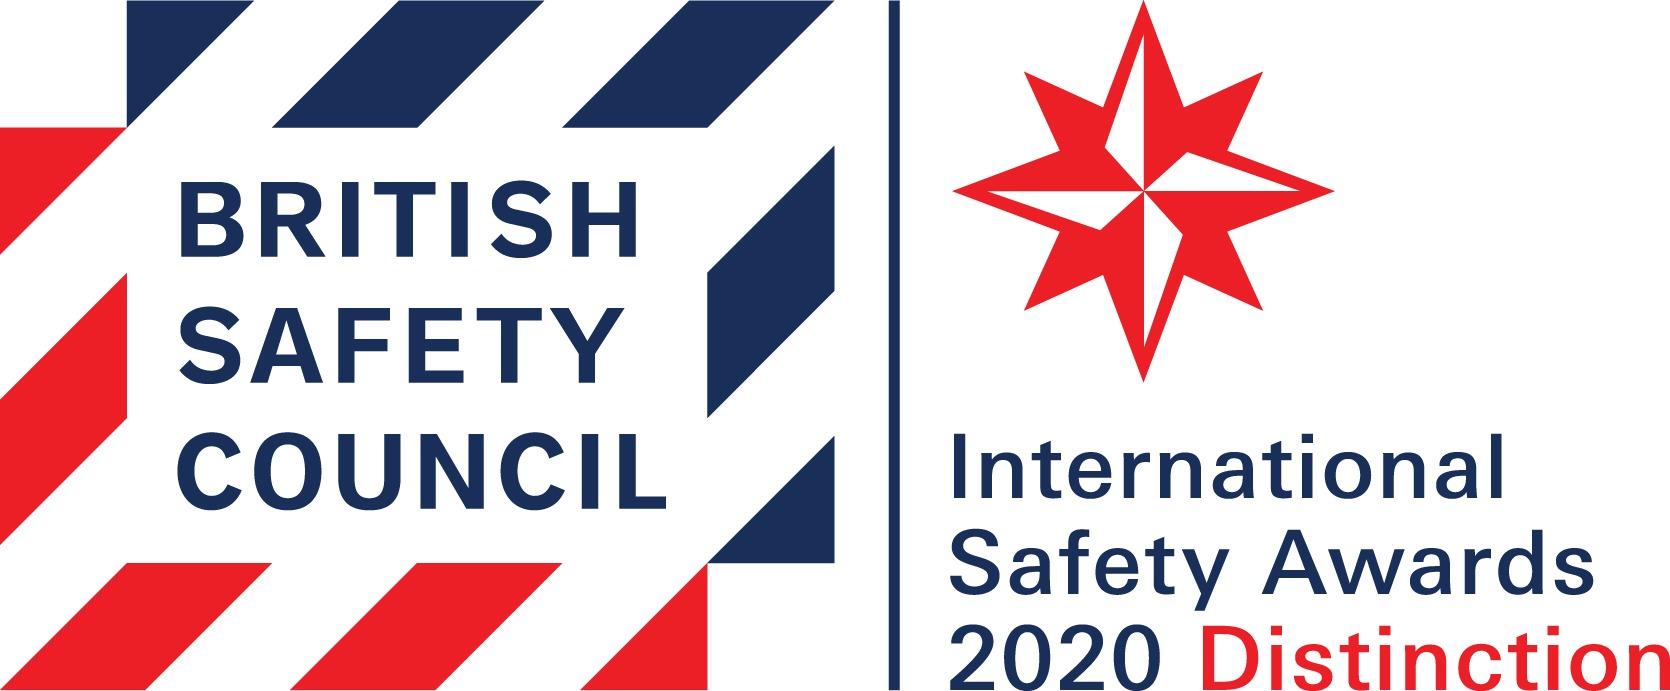 Roger-Bullivant-British-Safety-Council-International-Safety-Award